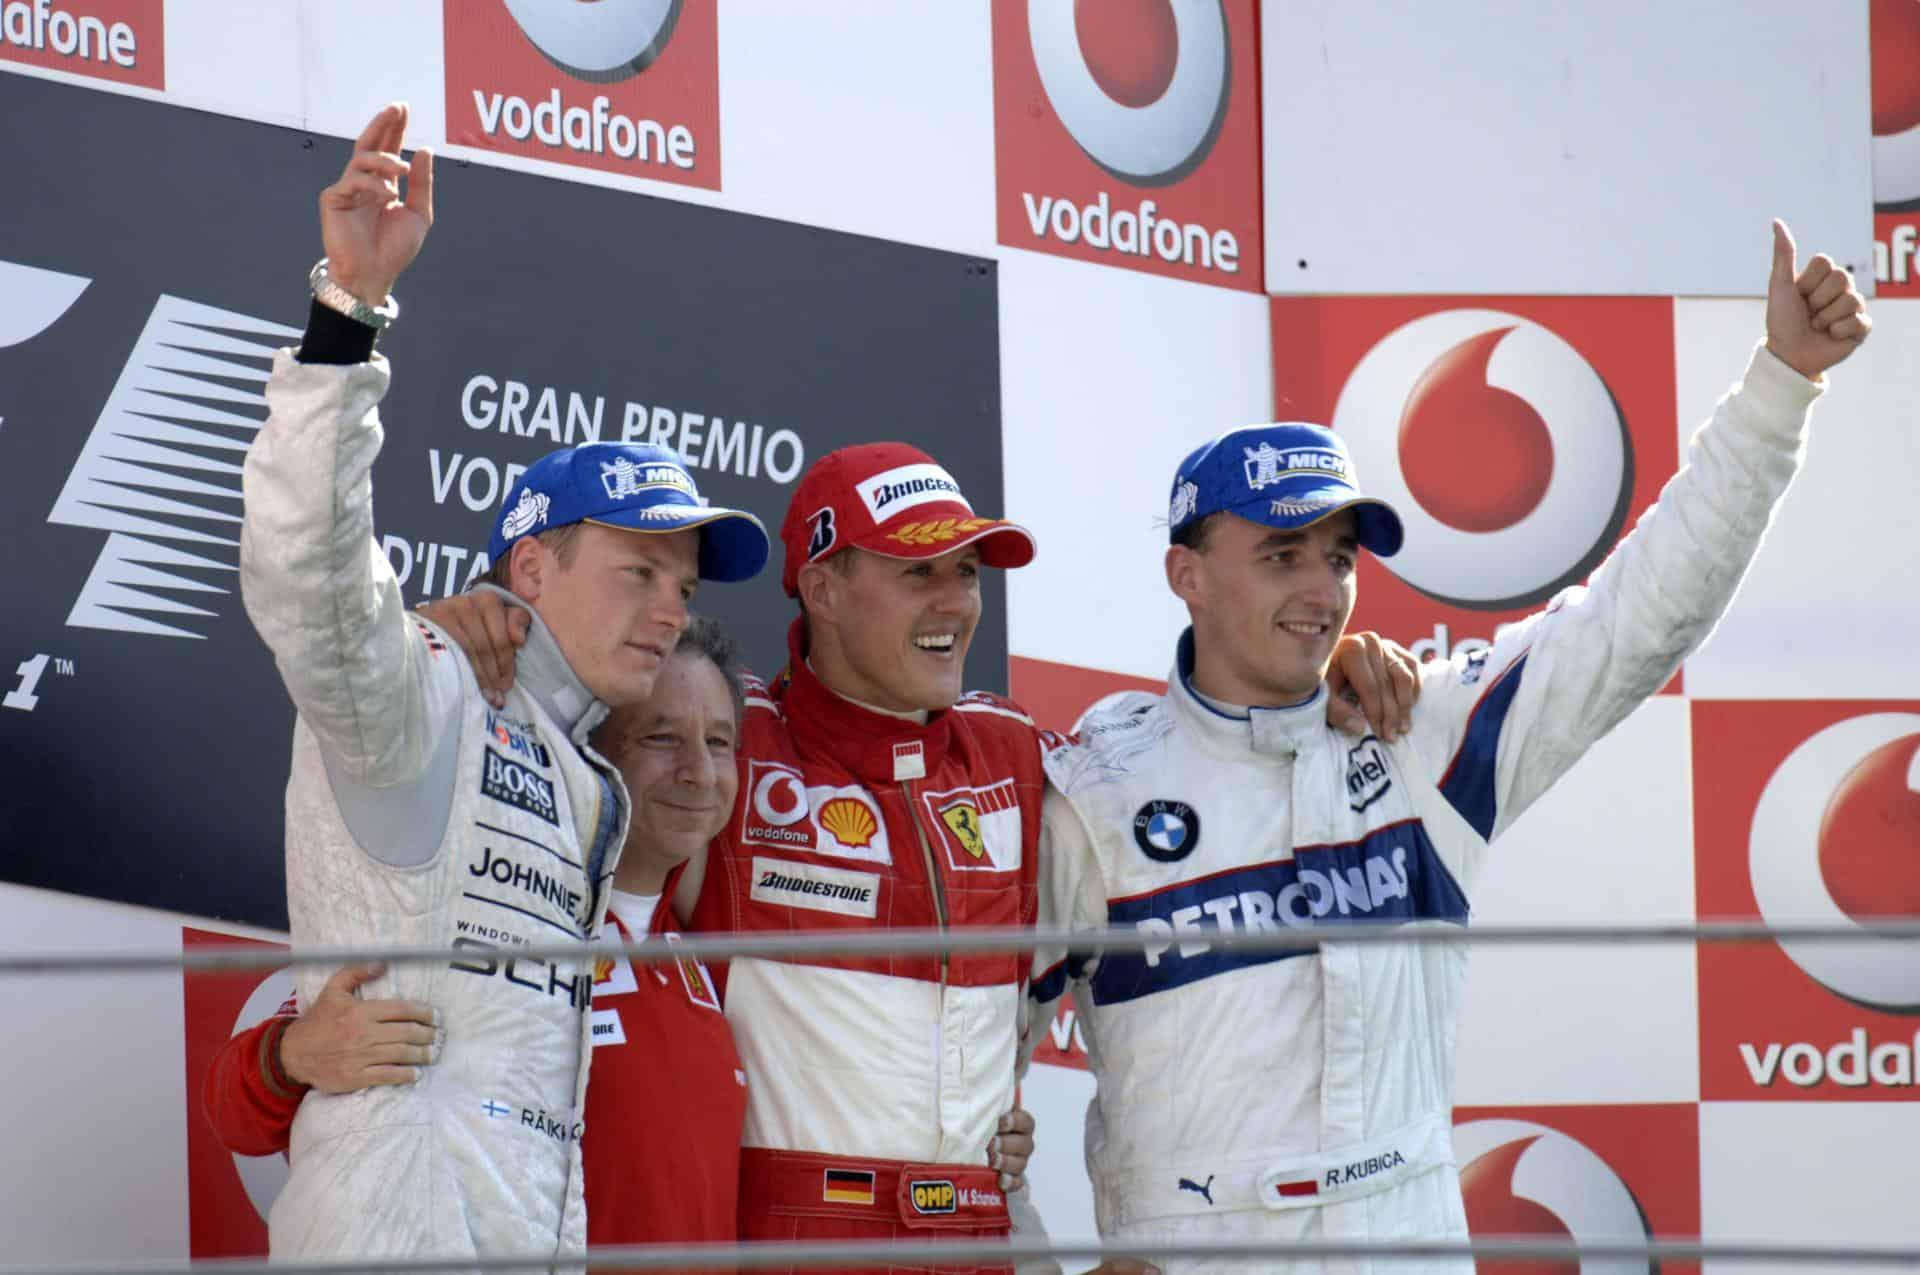 Italian GP F1 2006 Monza podium Photo Ferrari